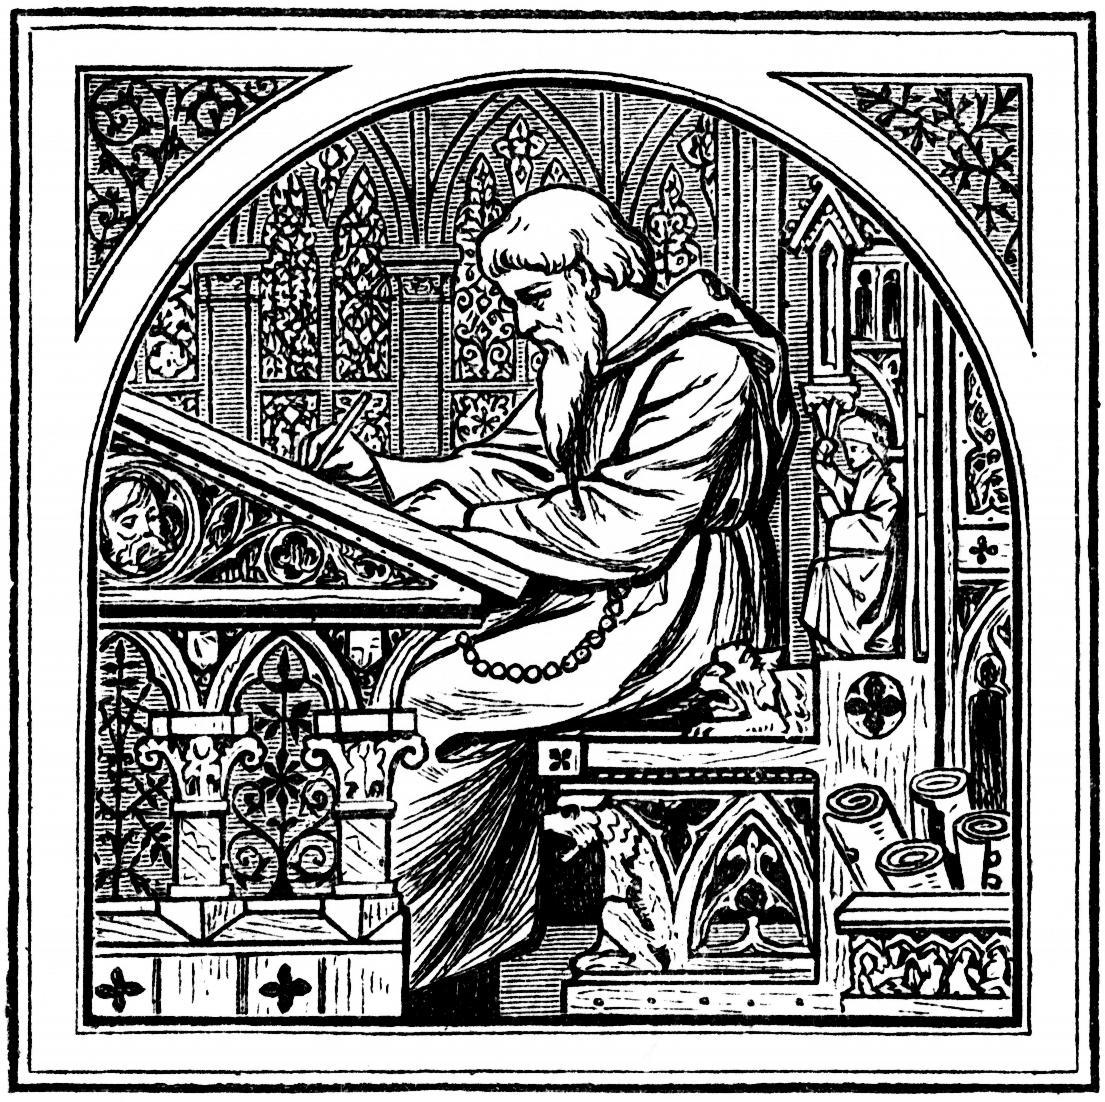 download robert fludd hermetic philosopher and surveyor of two worlds art imagination